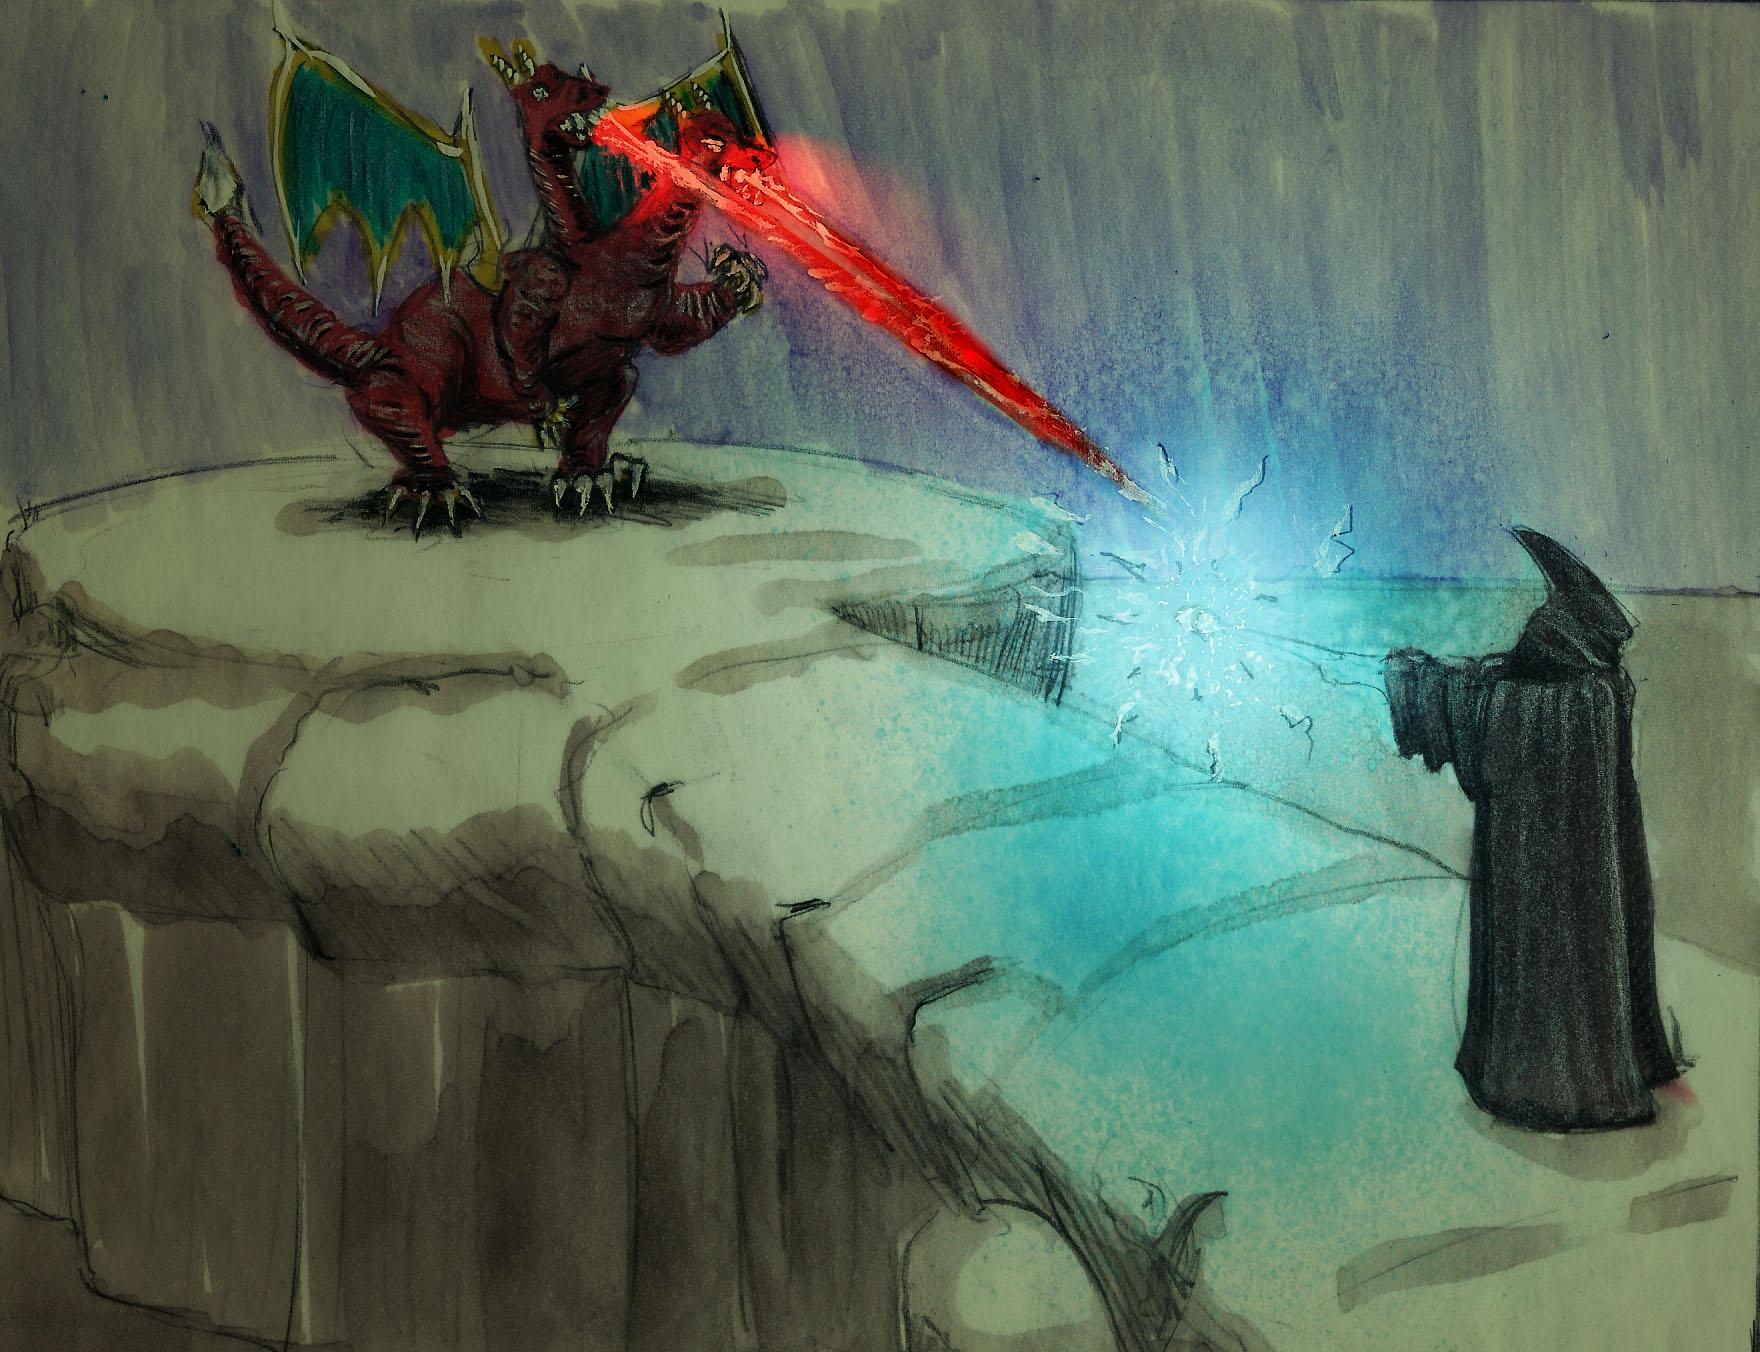 Download Wizard Vs. Dragon Games - purebackup | 1760 x 1352 jpeg 407kB